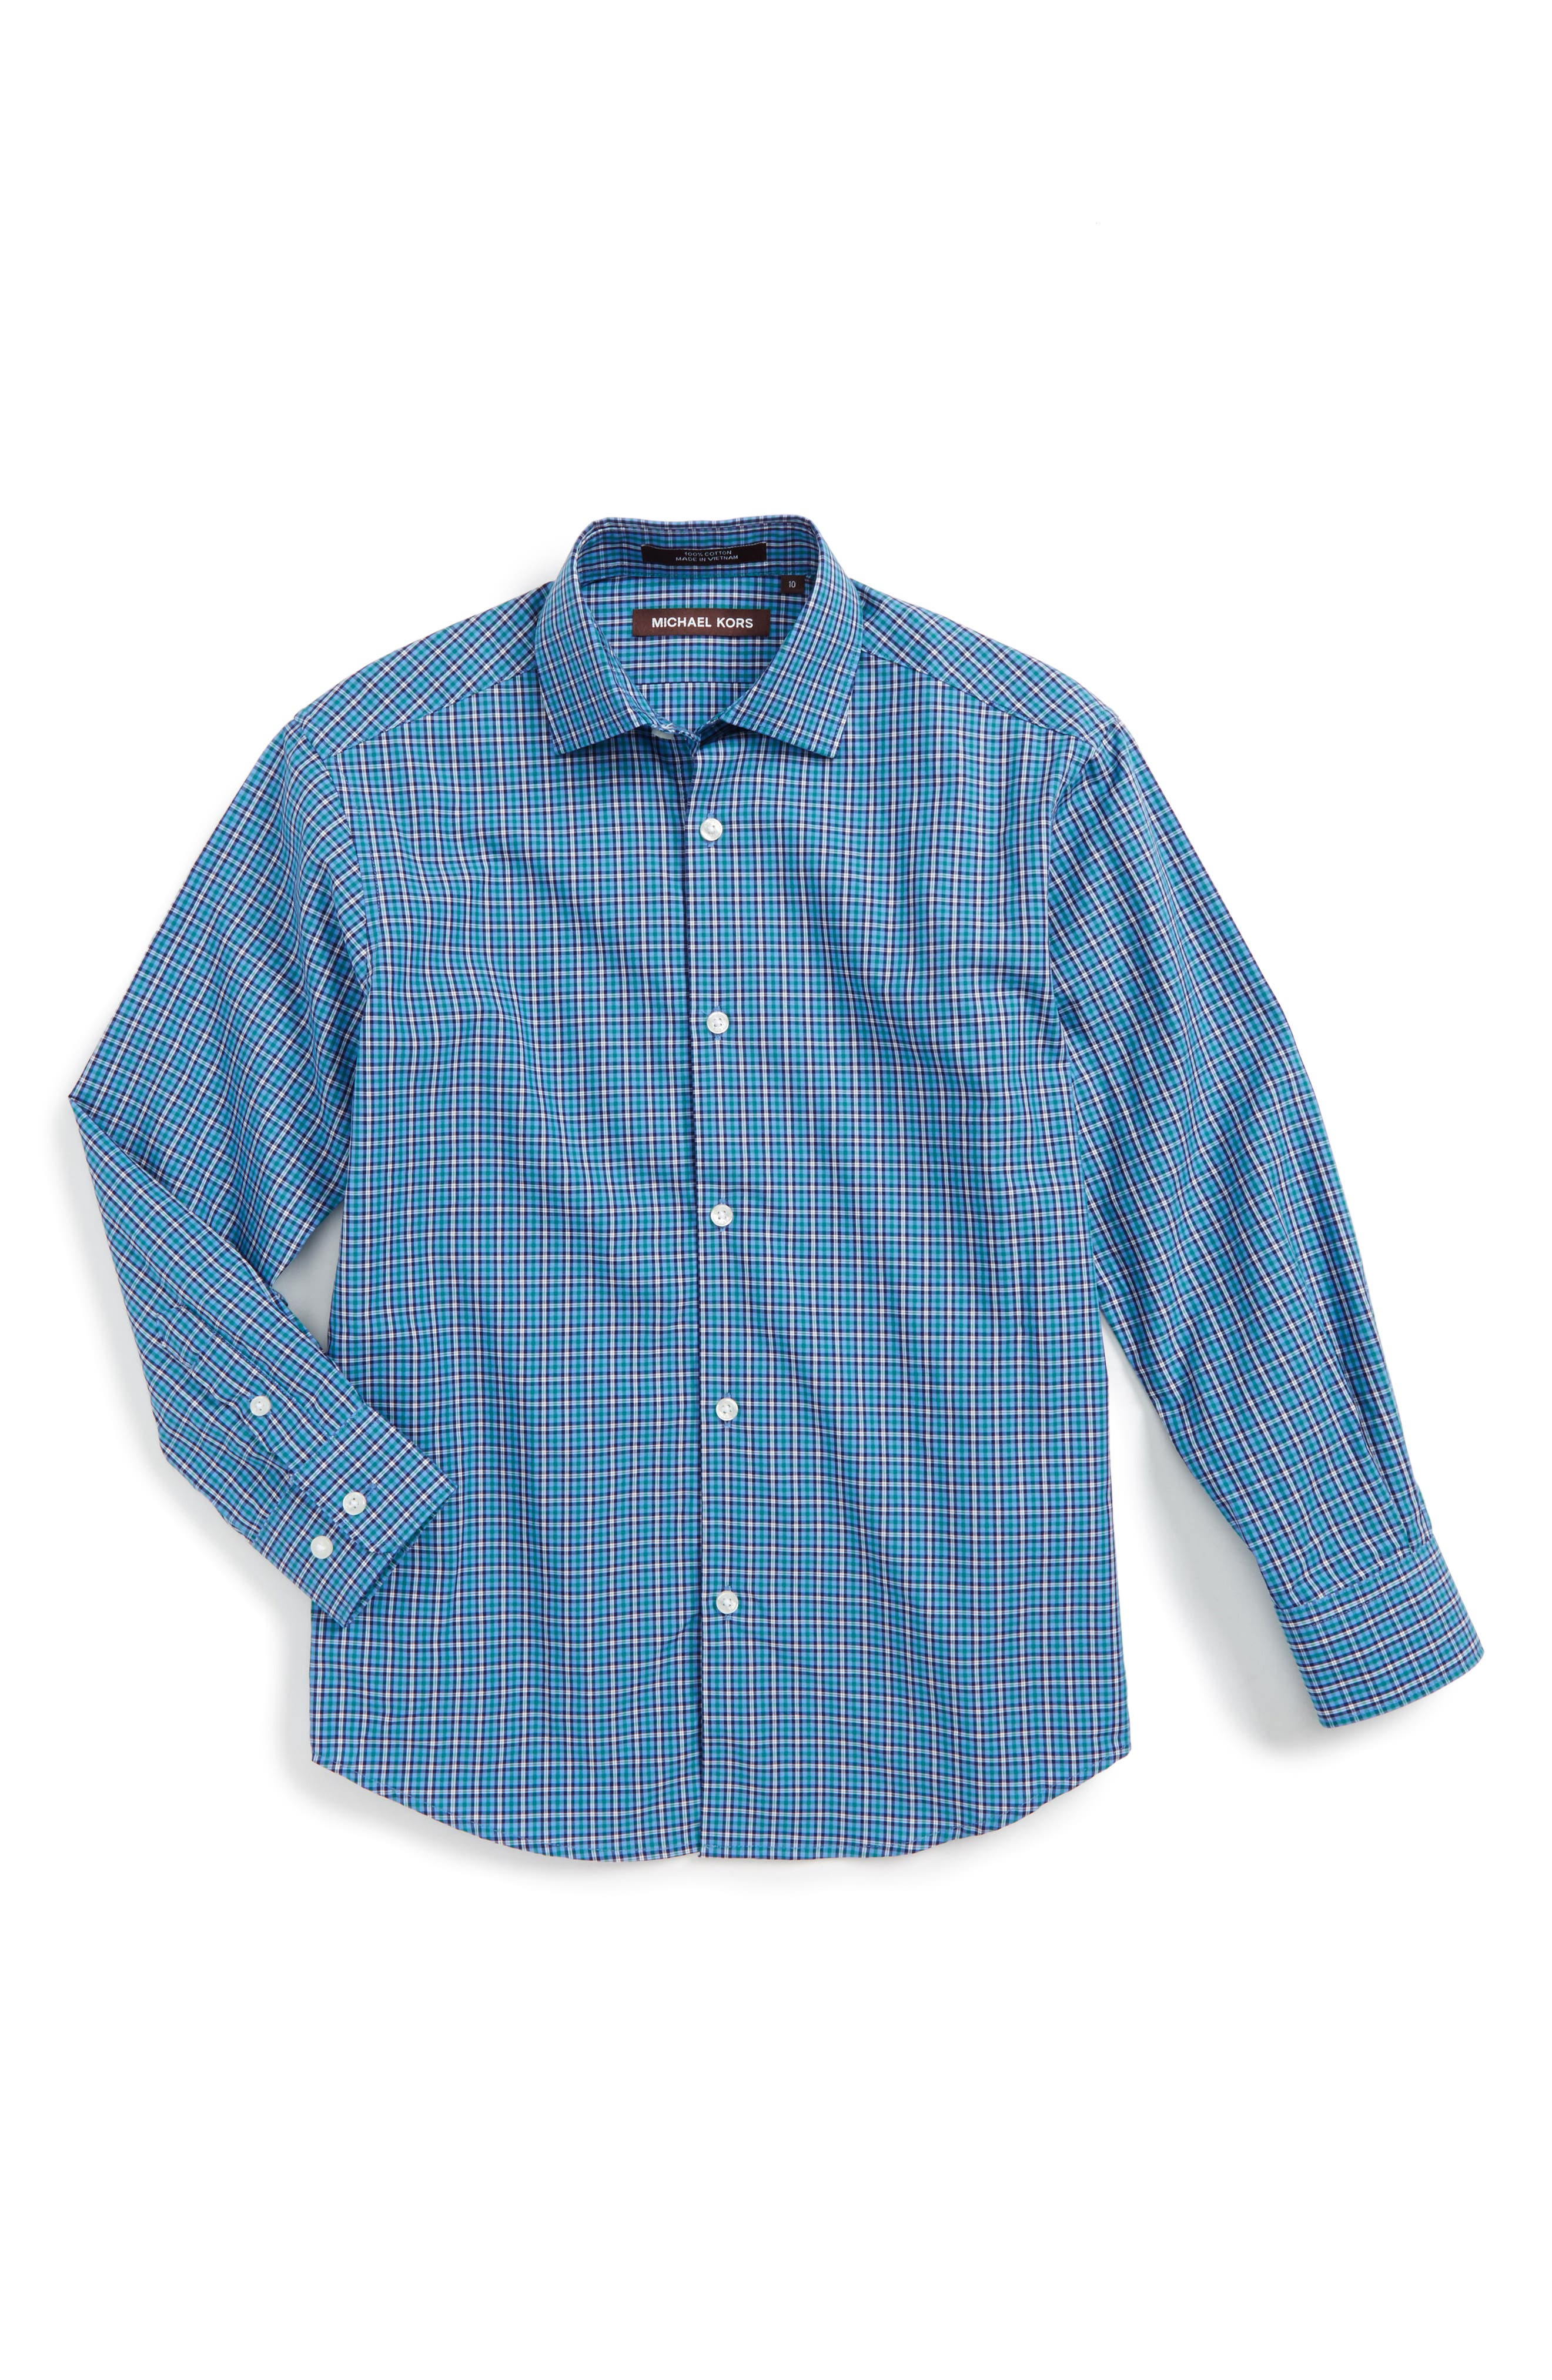 Check Dress Shirt,                         Main,                         color, Blue/ Green